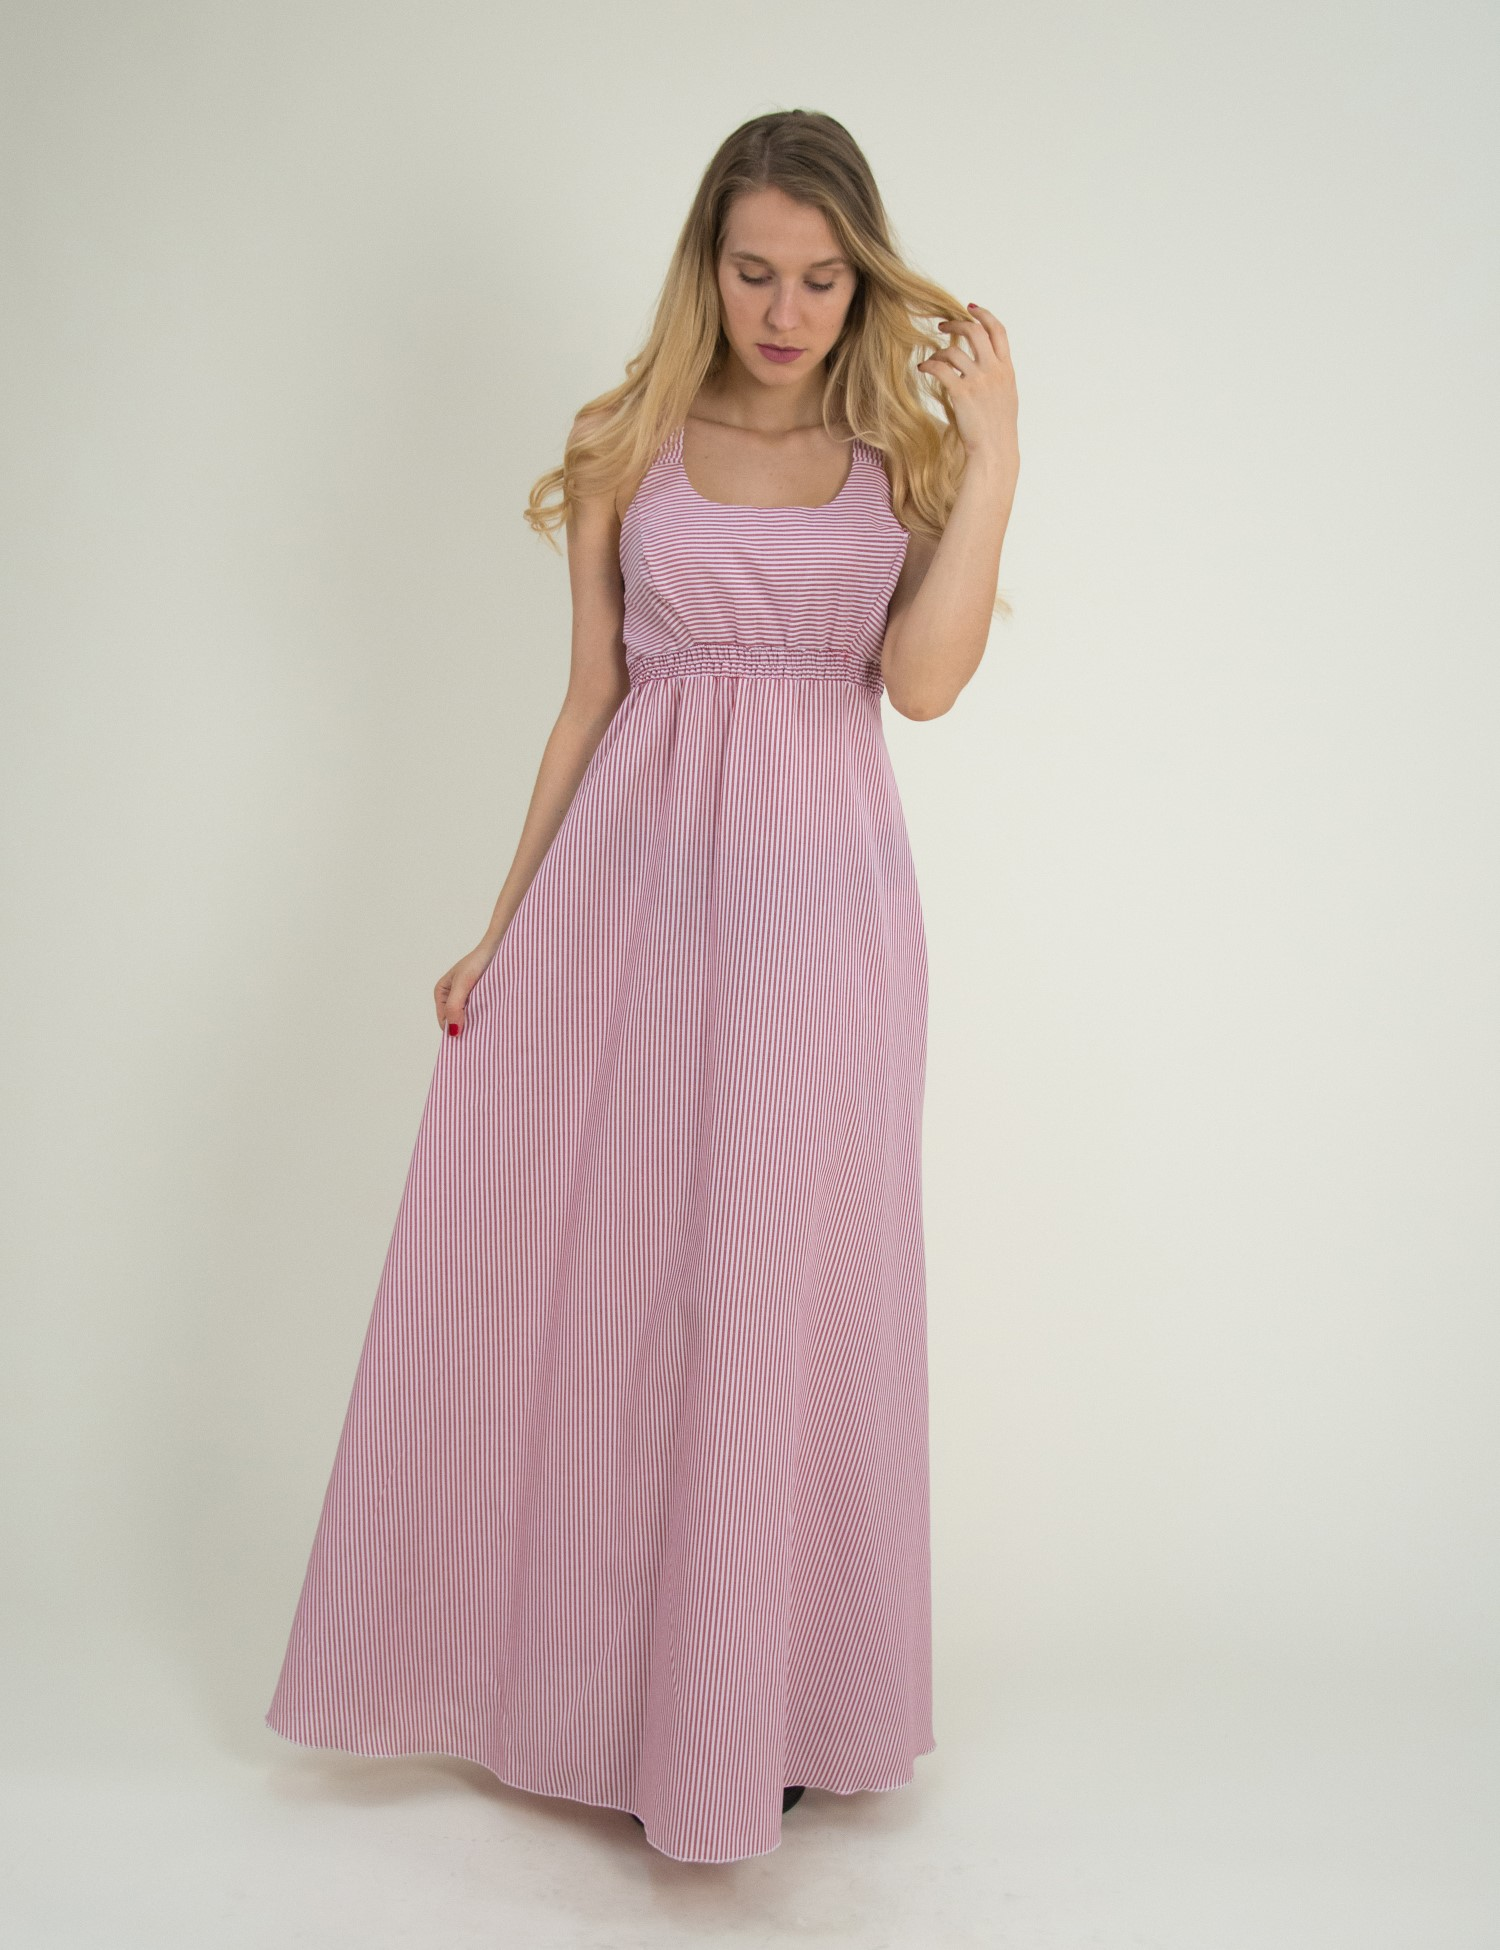 9b41d106cd9b Torouxo Γυναικείο Maxi ριγέ φόρεμα Coocu κόκκινο χιαστί πλάτη 92381C